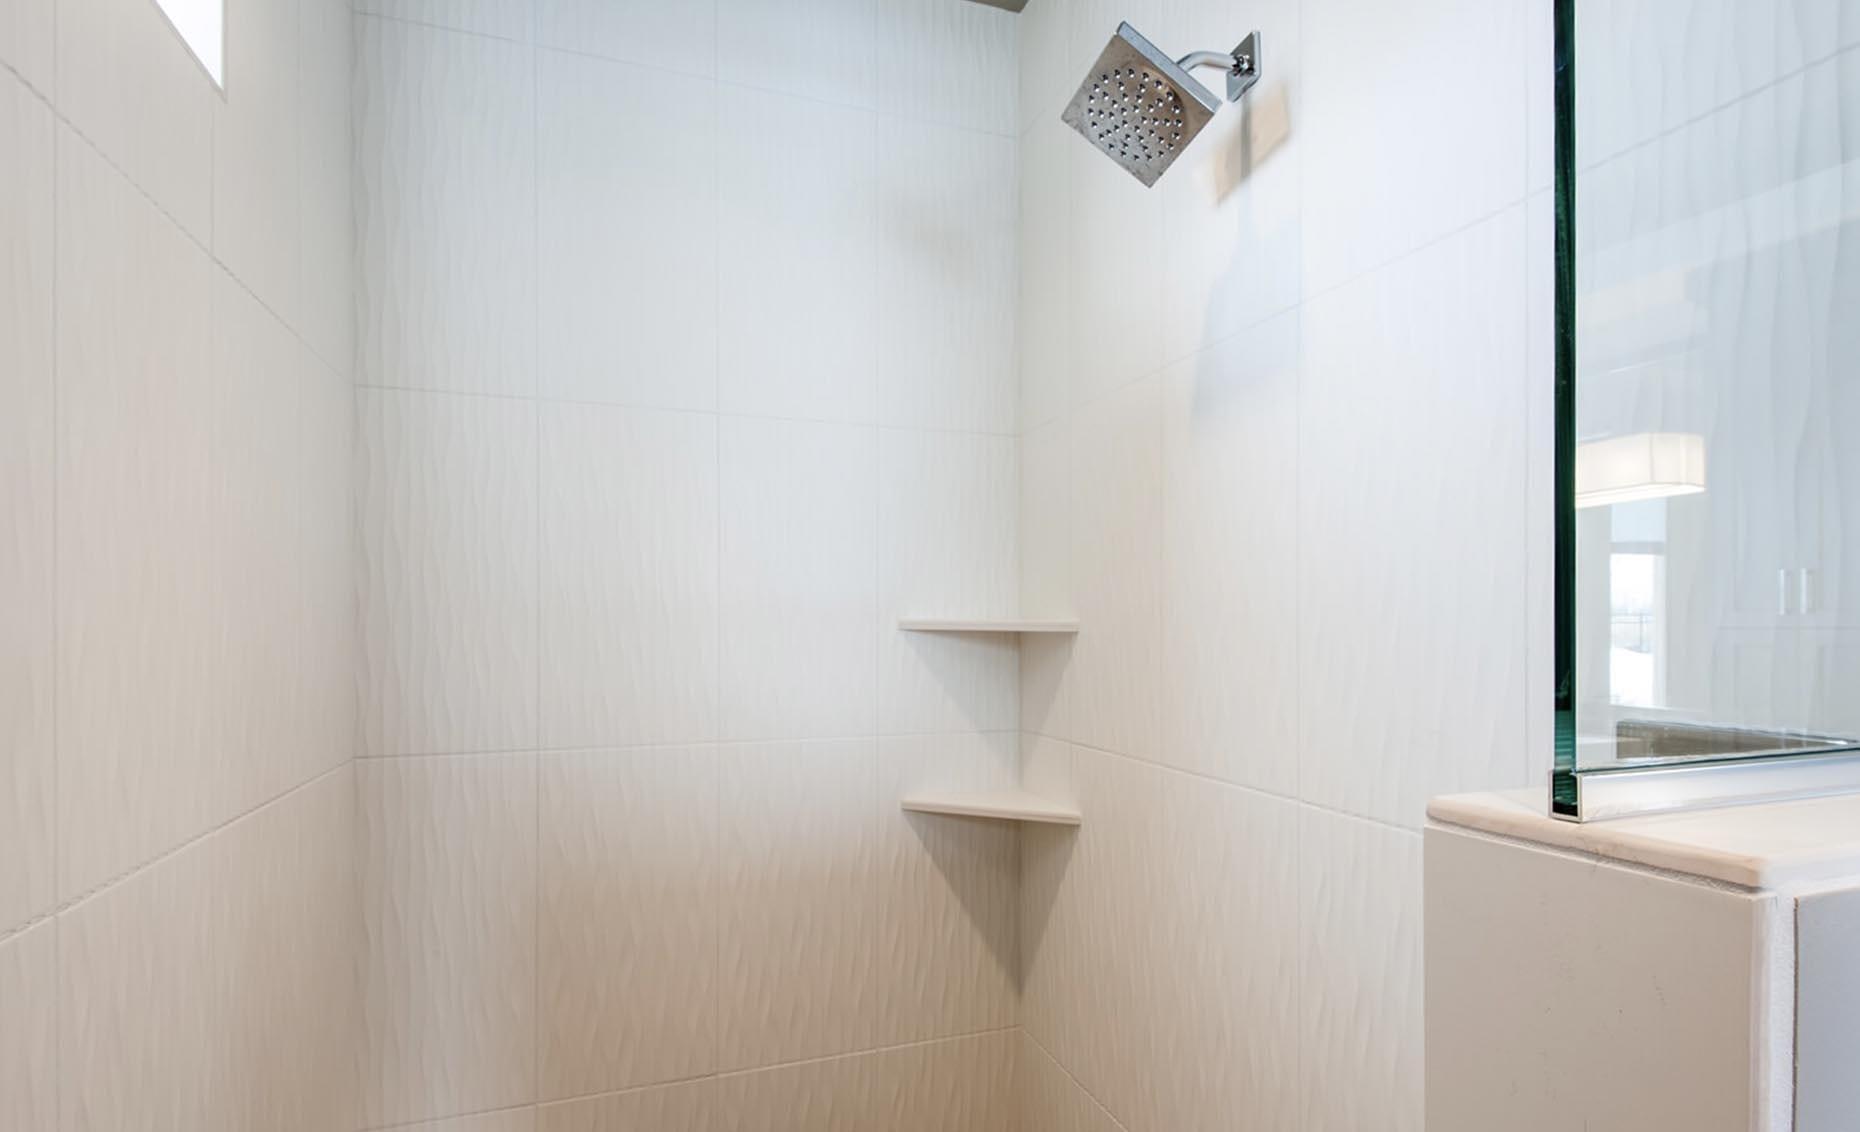 The Corrente Bello House Master Bathroom Shower